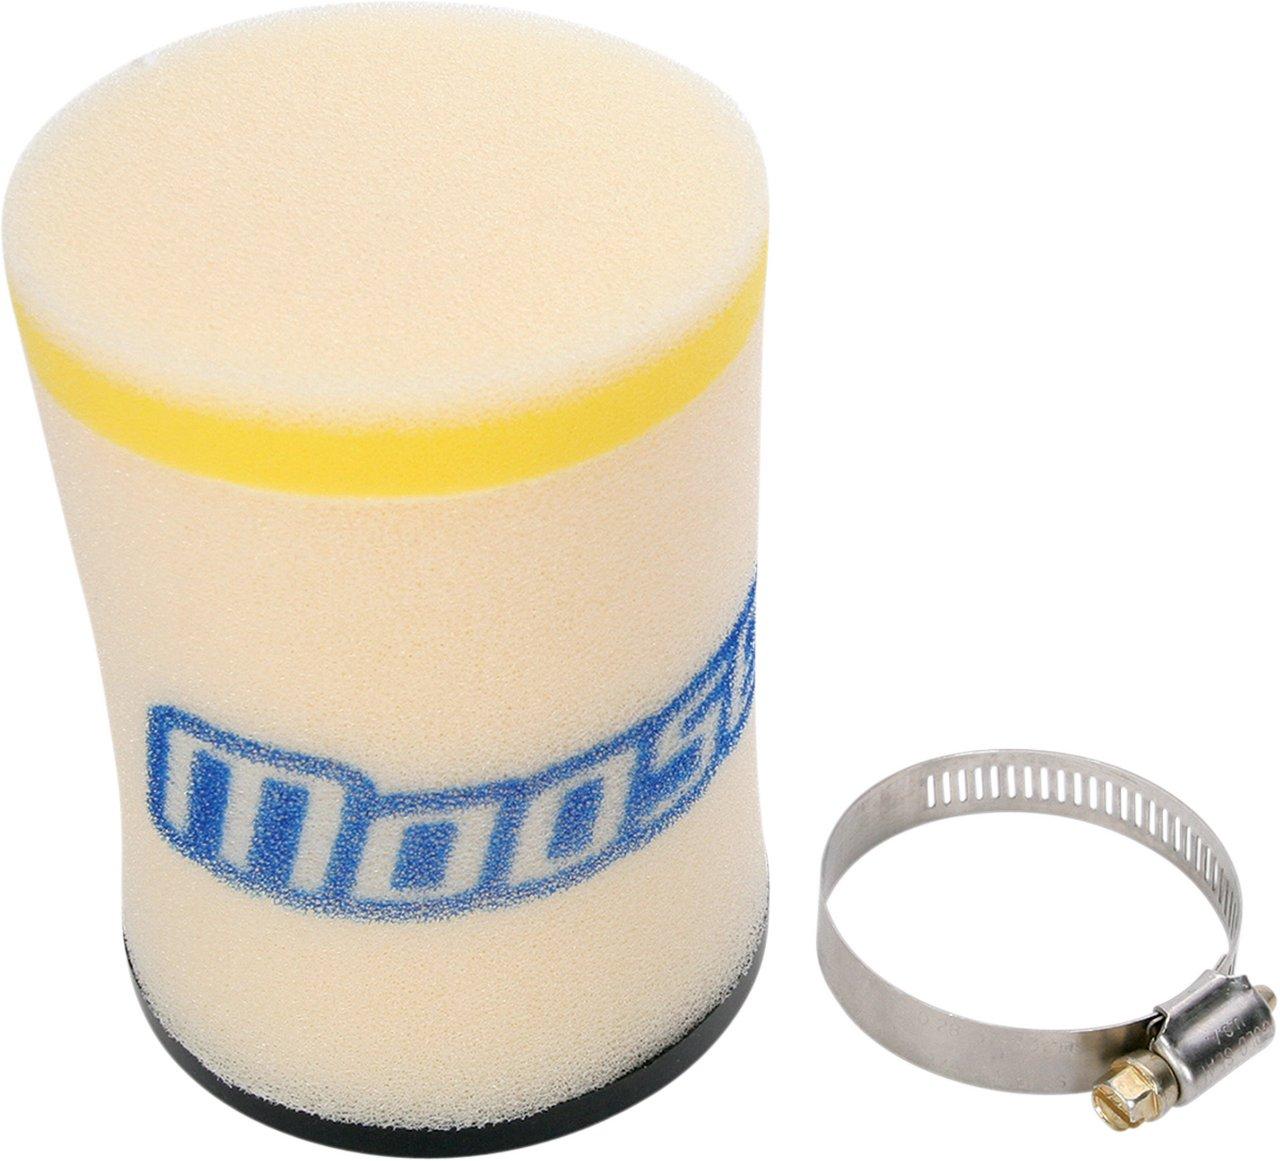 【MOOSE RACING】PPO (PRECISION PRE-OILED) 空氣濾芯 [M763-80-11] - 「Webike-摩托百貨」